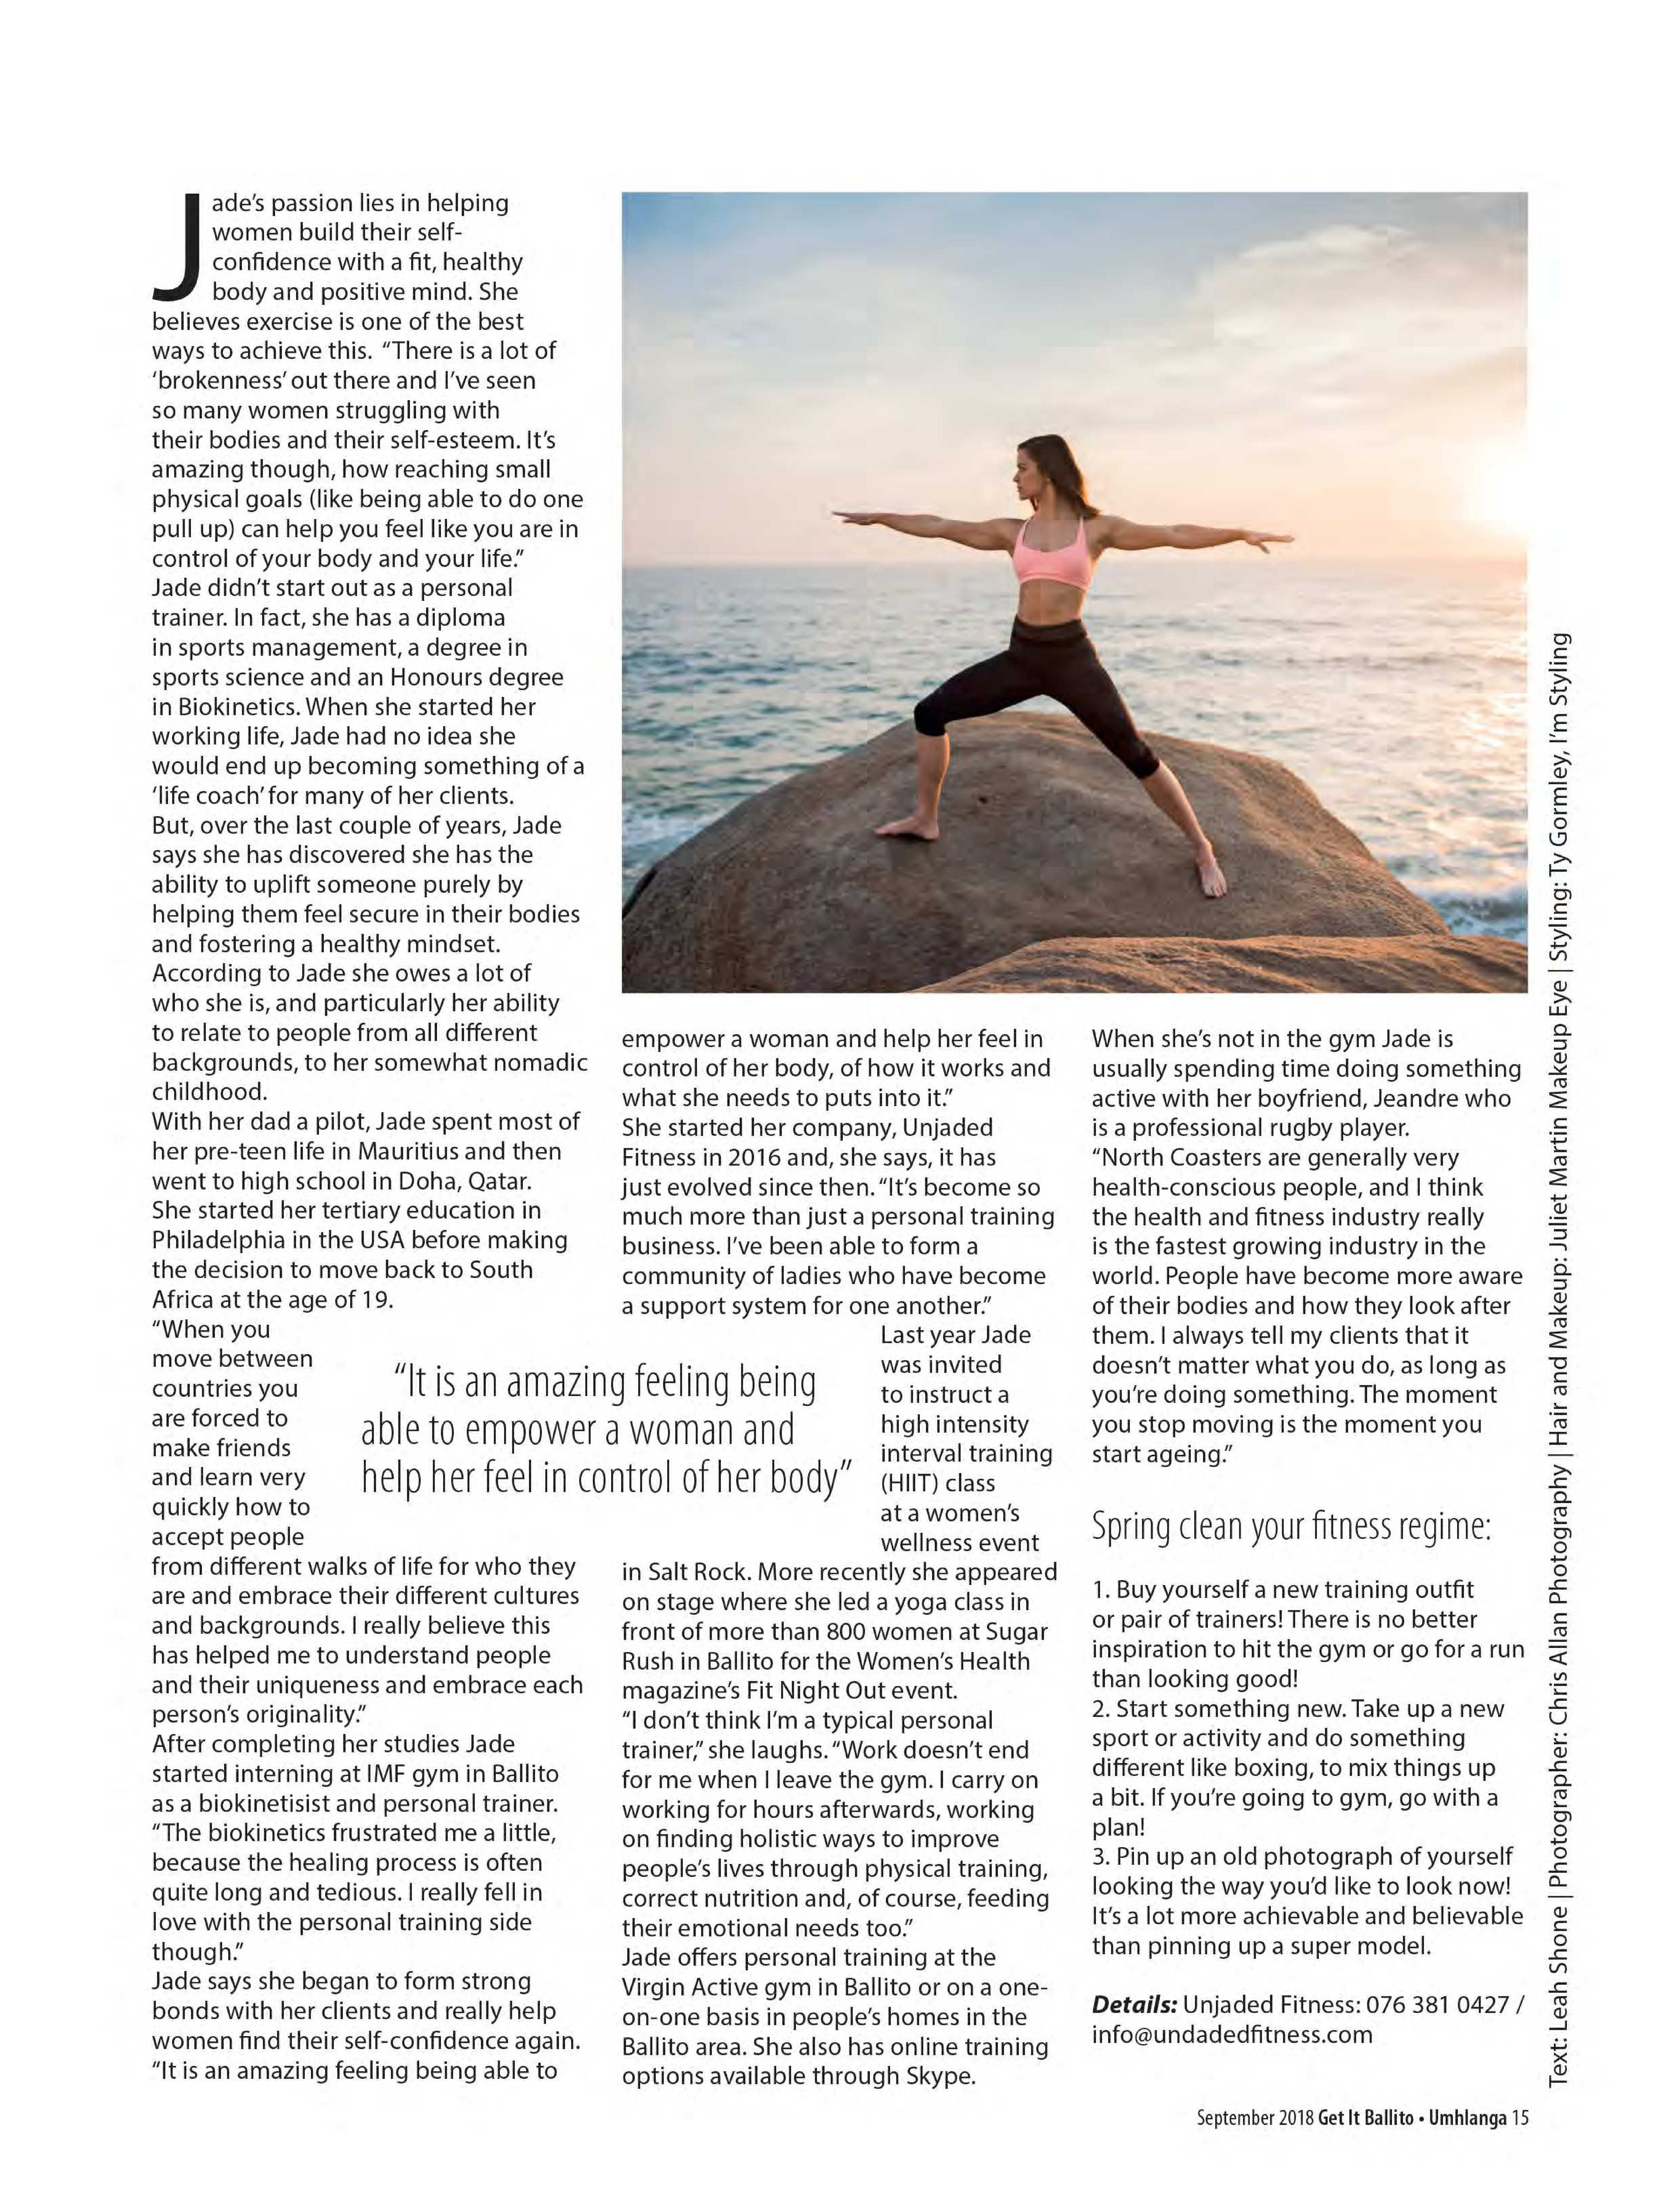 get-magazine-ballitoumhlanga-september-2018-epapers-page-17